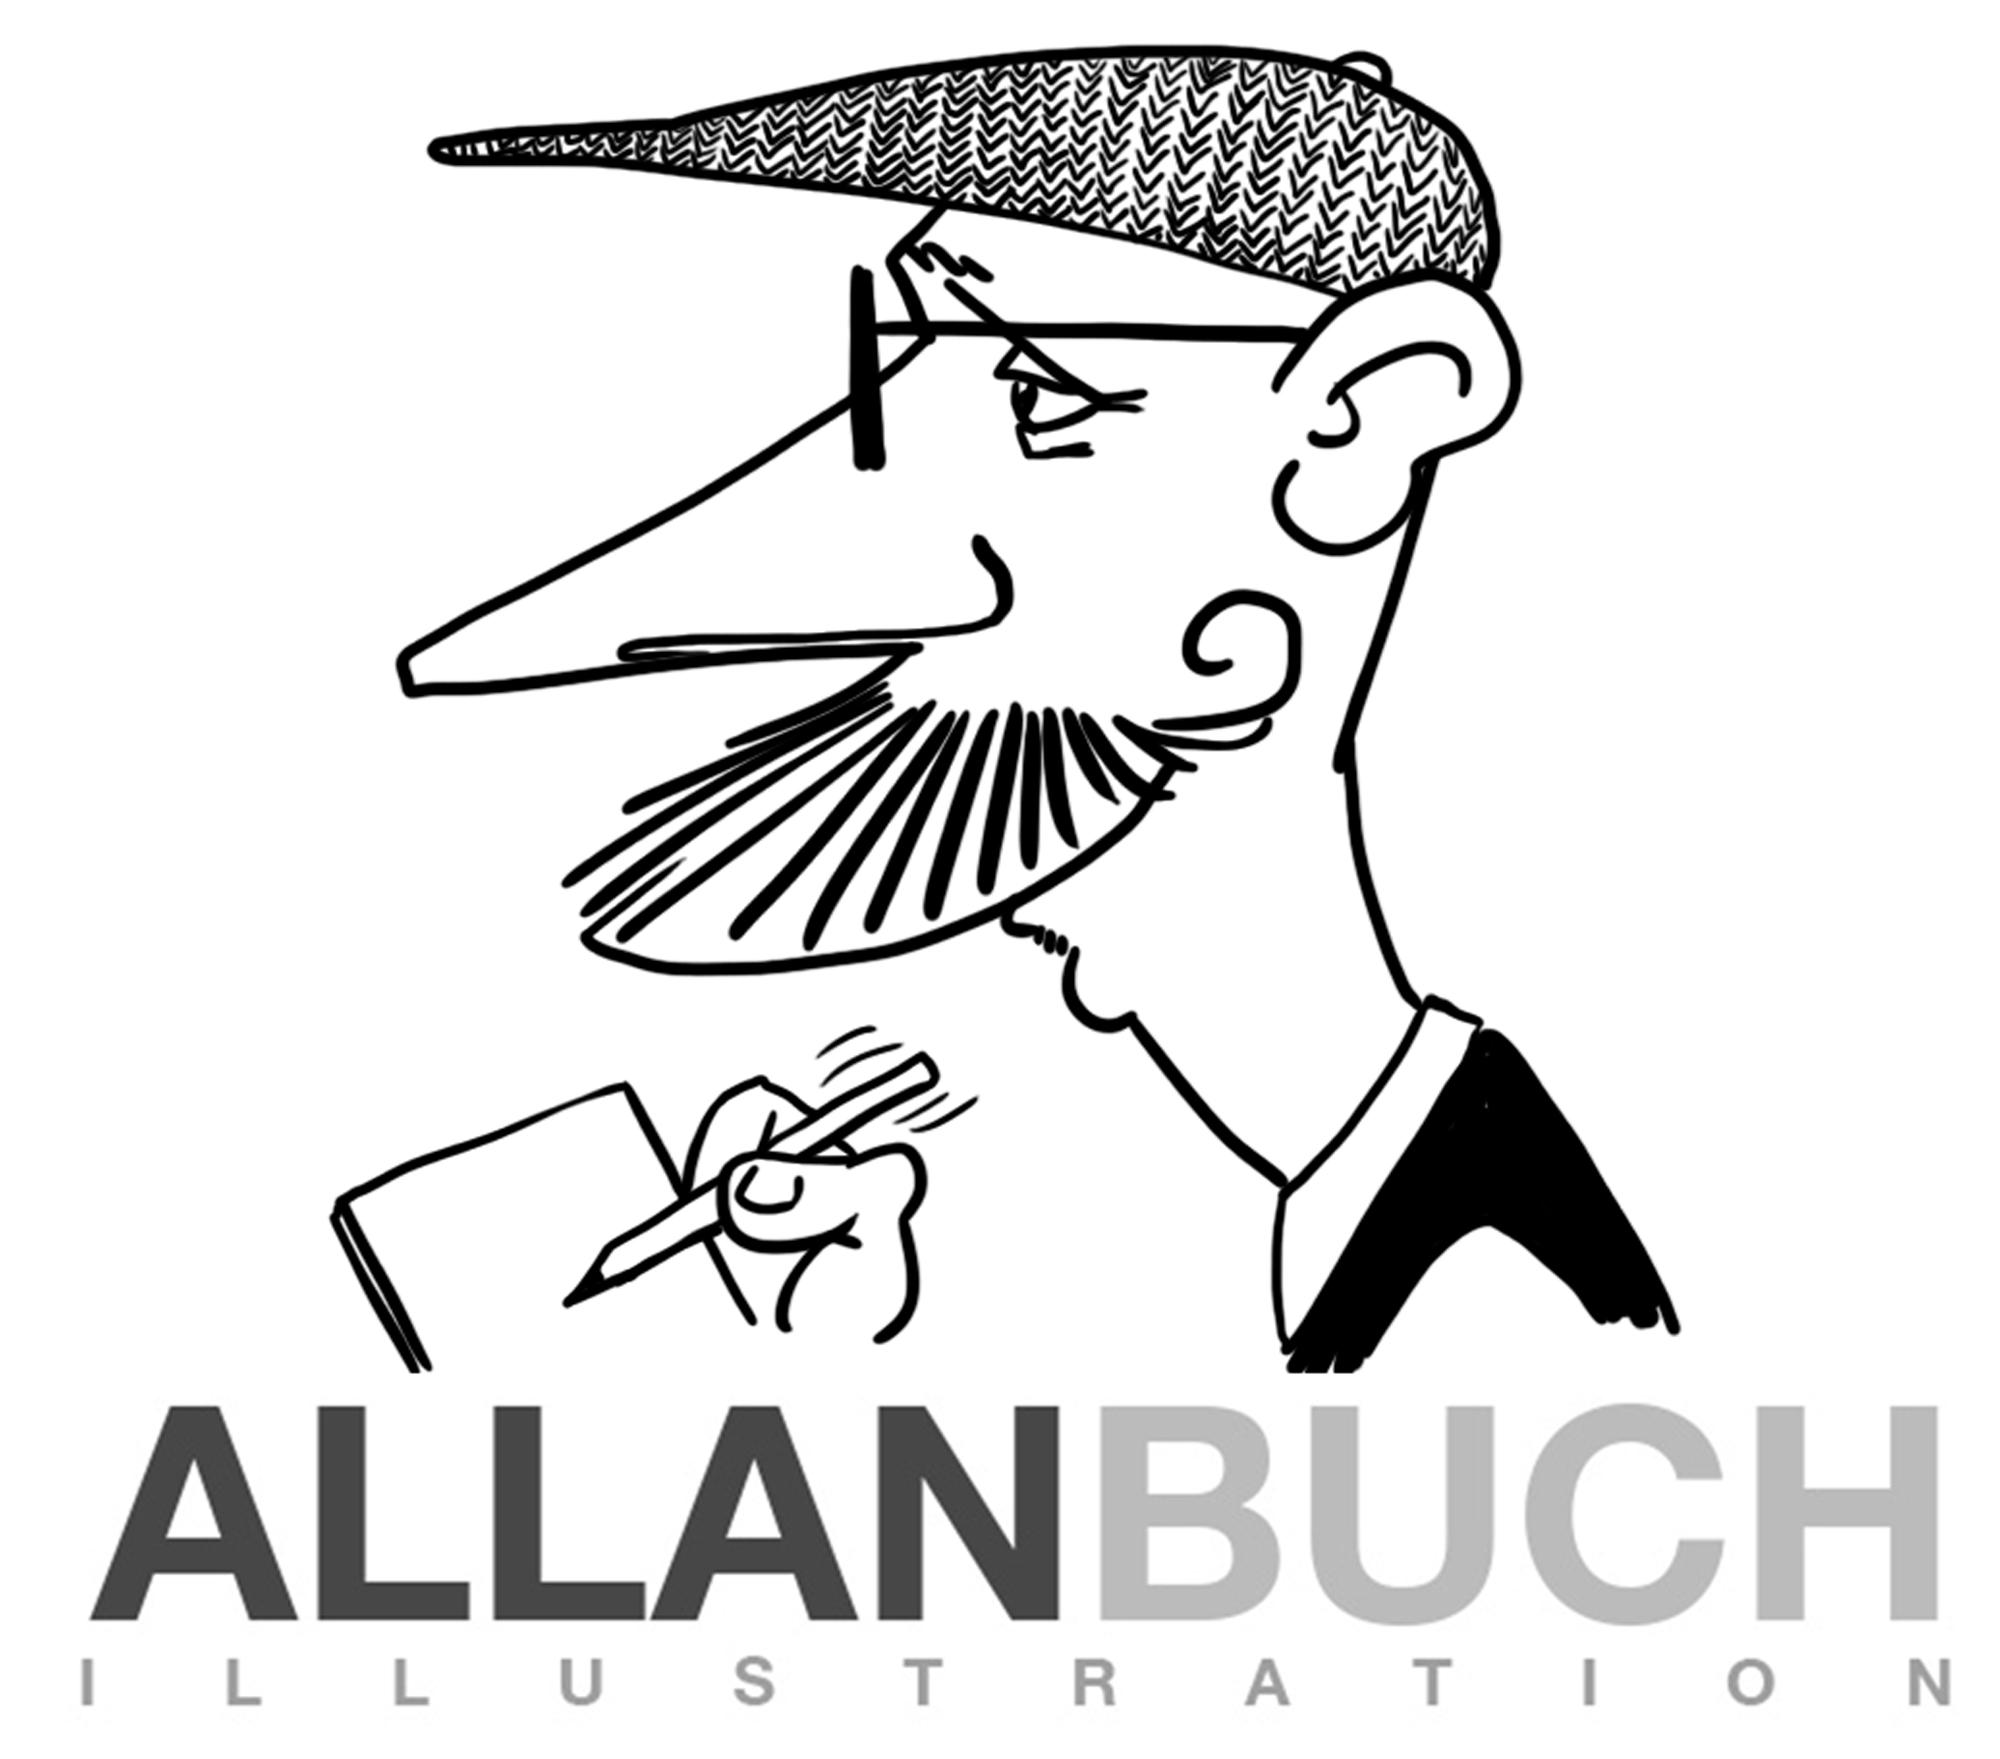 Karikaturtegner Allan Buch